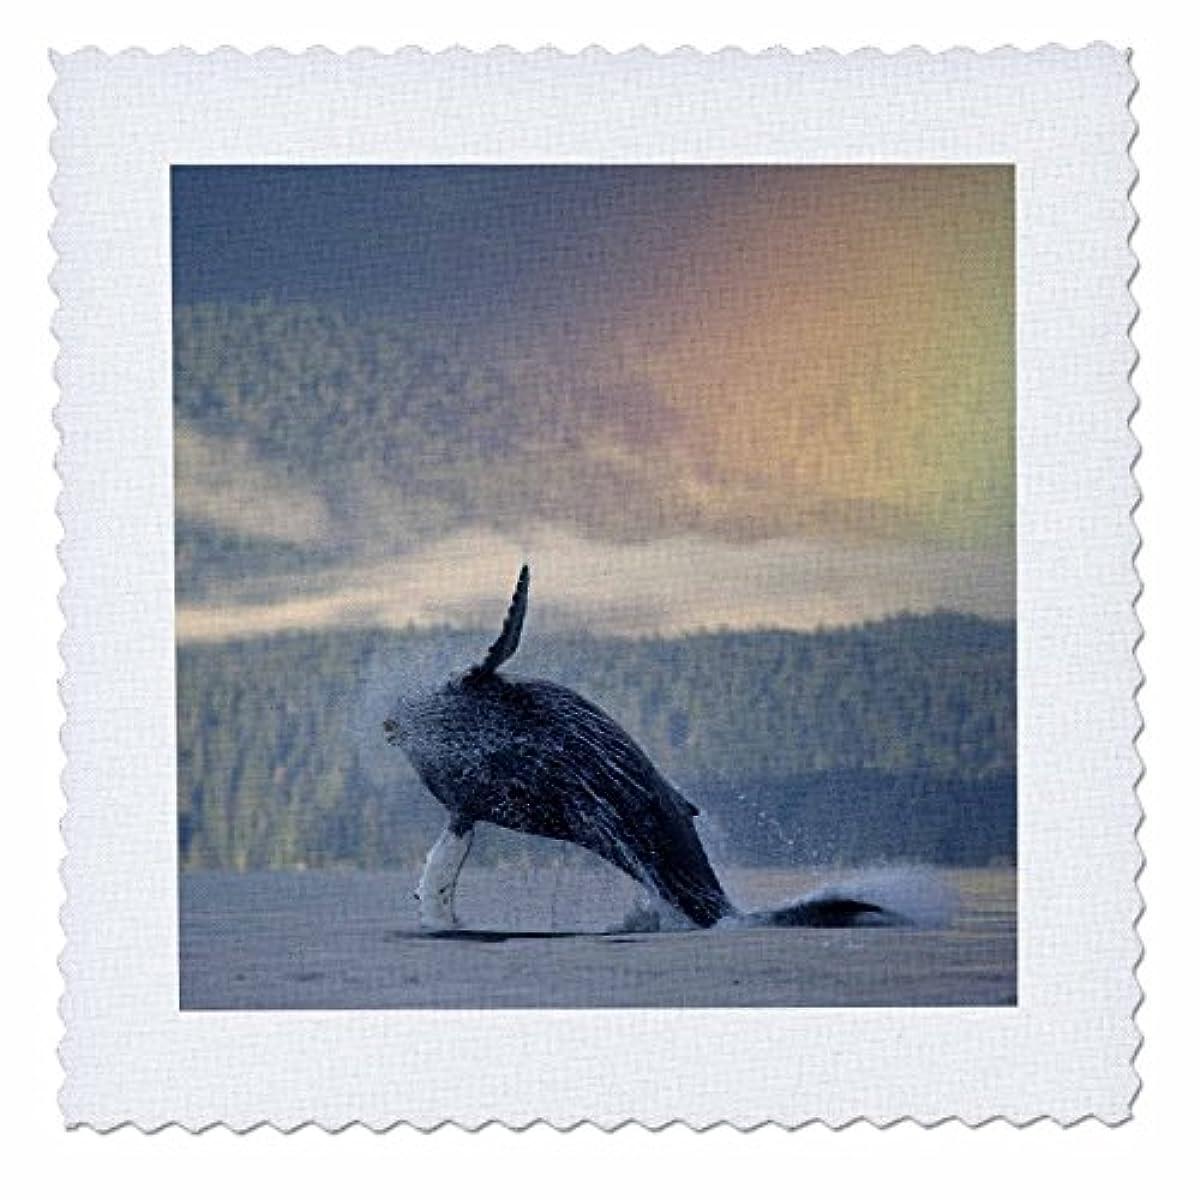 3dRose qs_87667_5 Alaska, Kodiak Island, Sea Otter wildlife-US02 PSO1053-Paul Souders-Quilt Square, 14 by 14